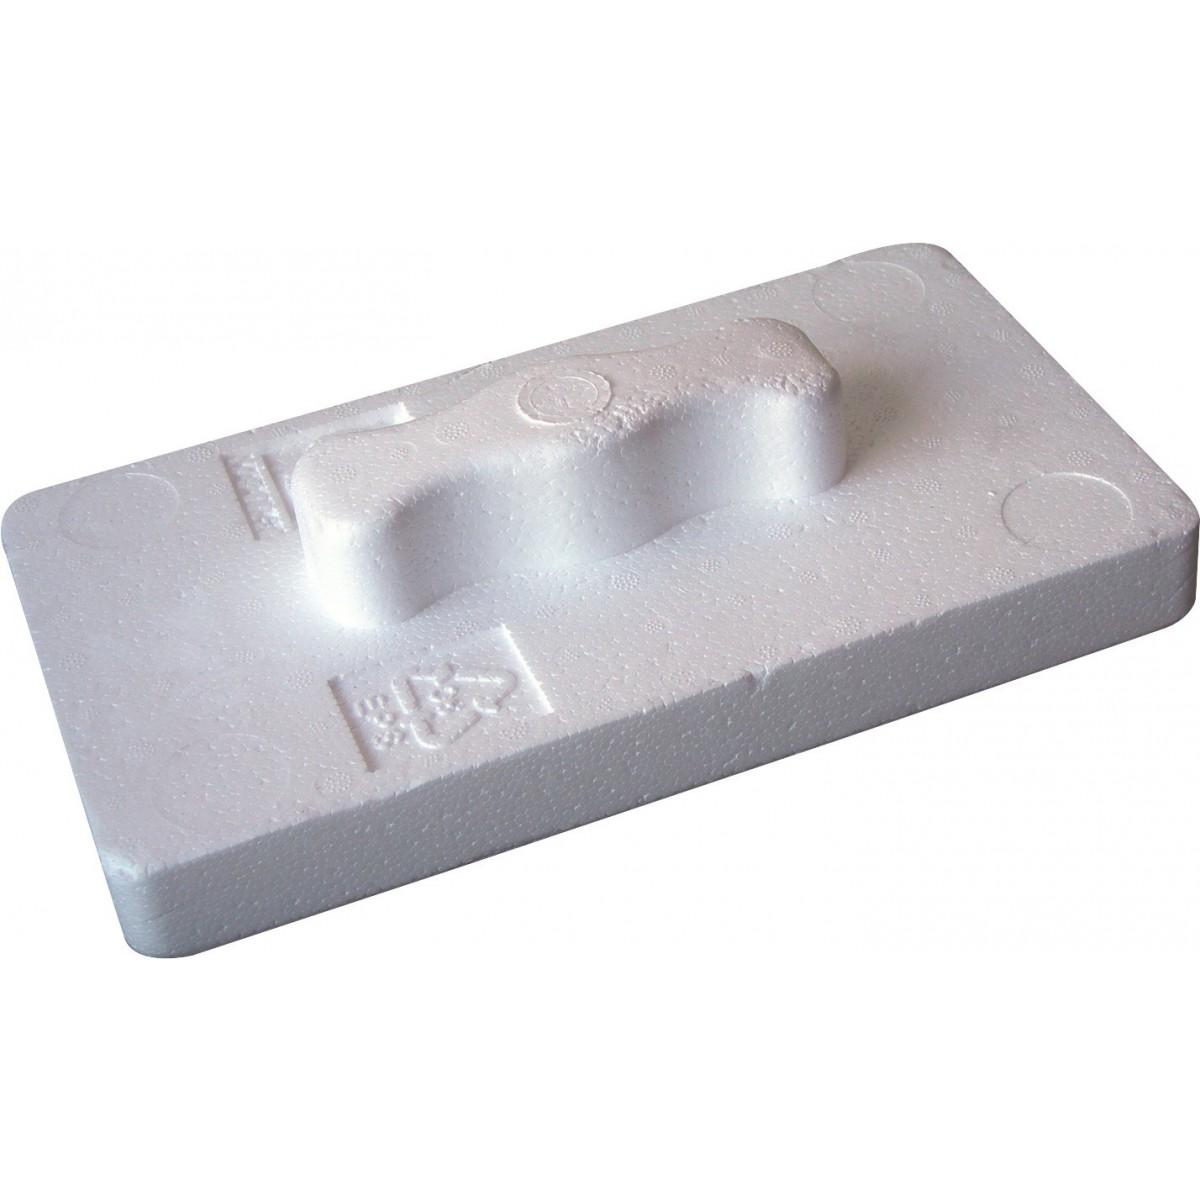 Taloche polystyrène expansé Outibat - Dimensions 27 x 15 cm